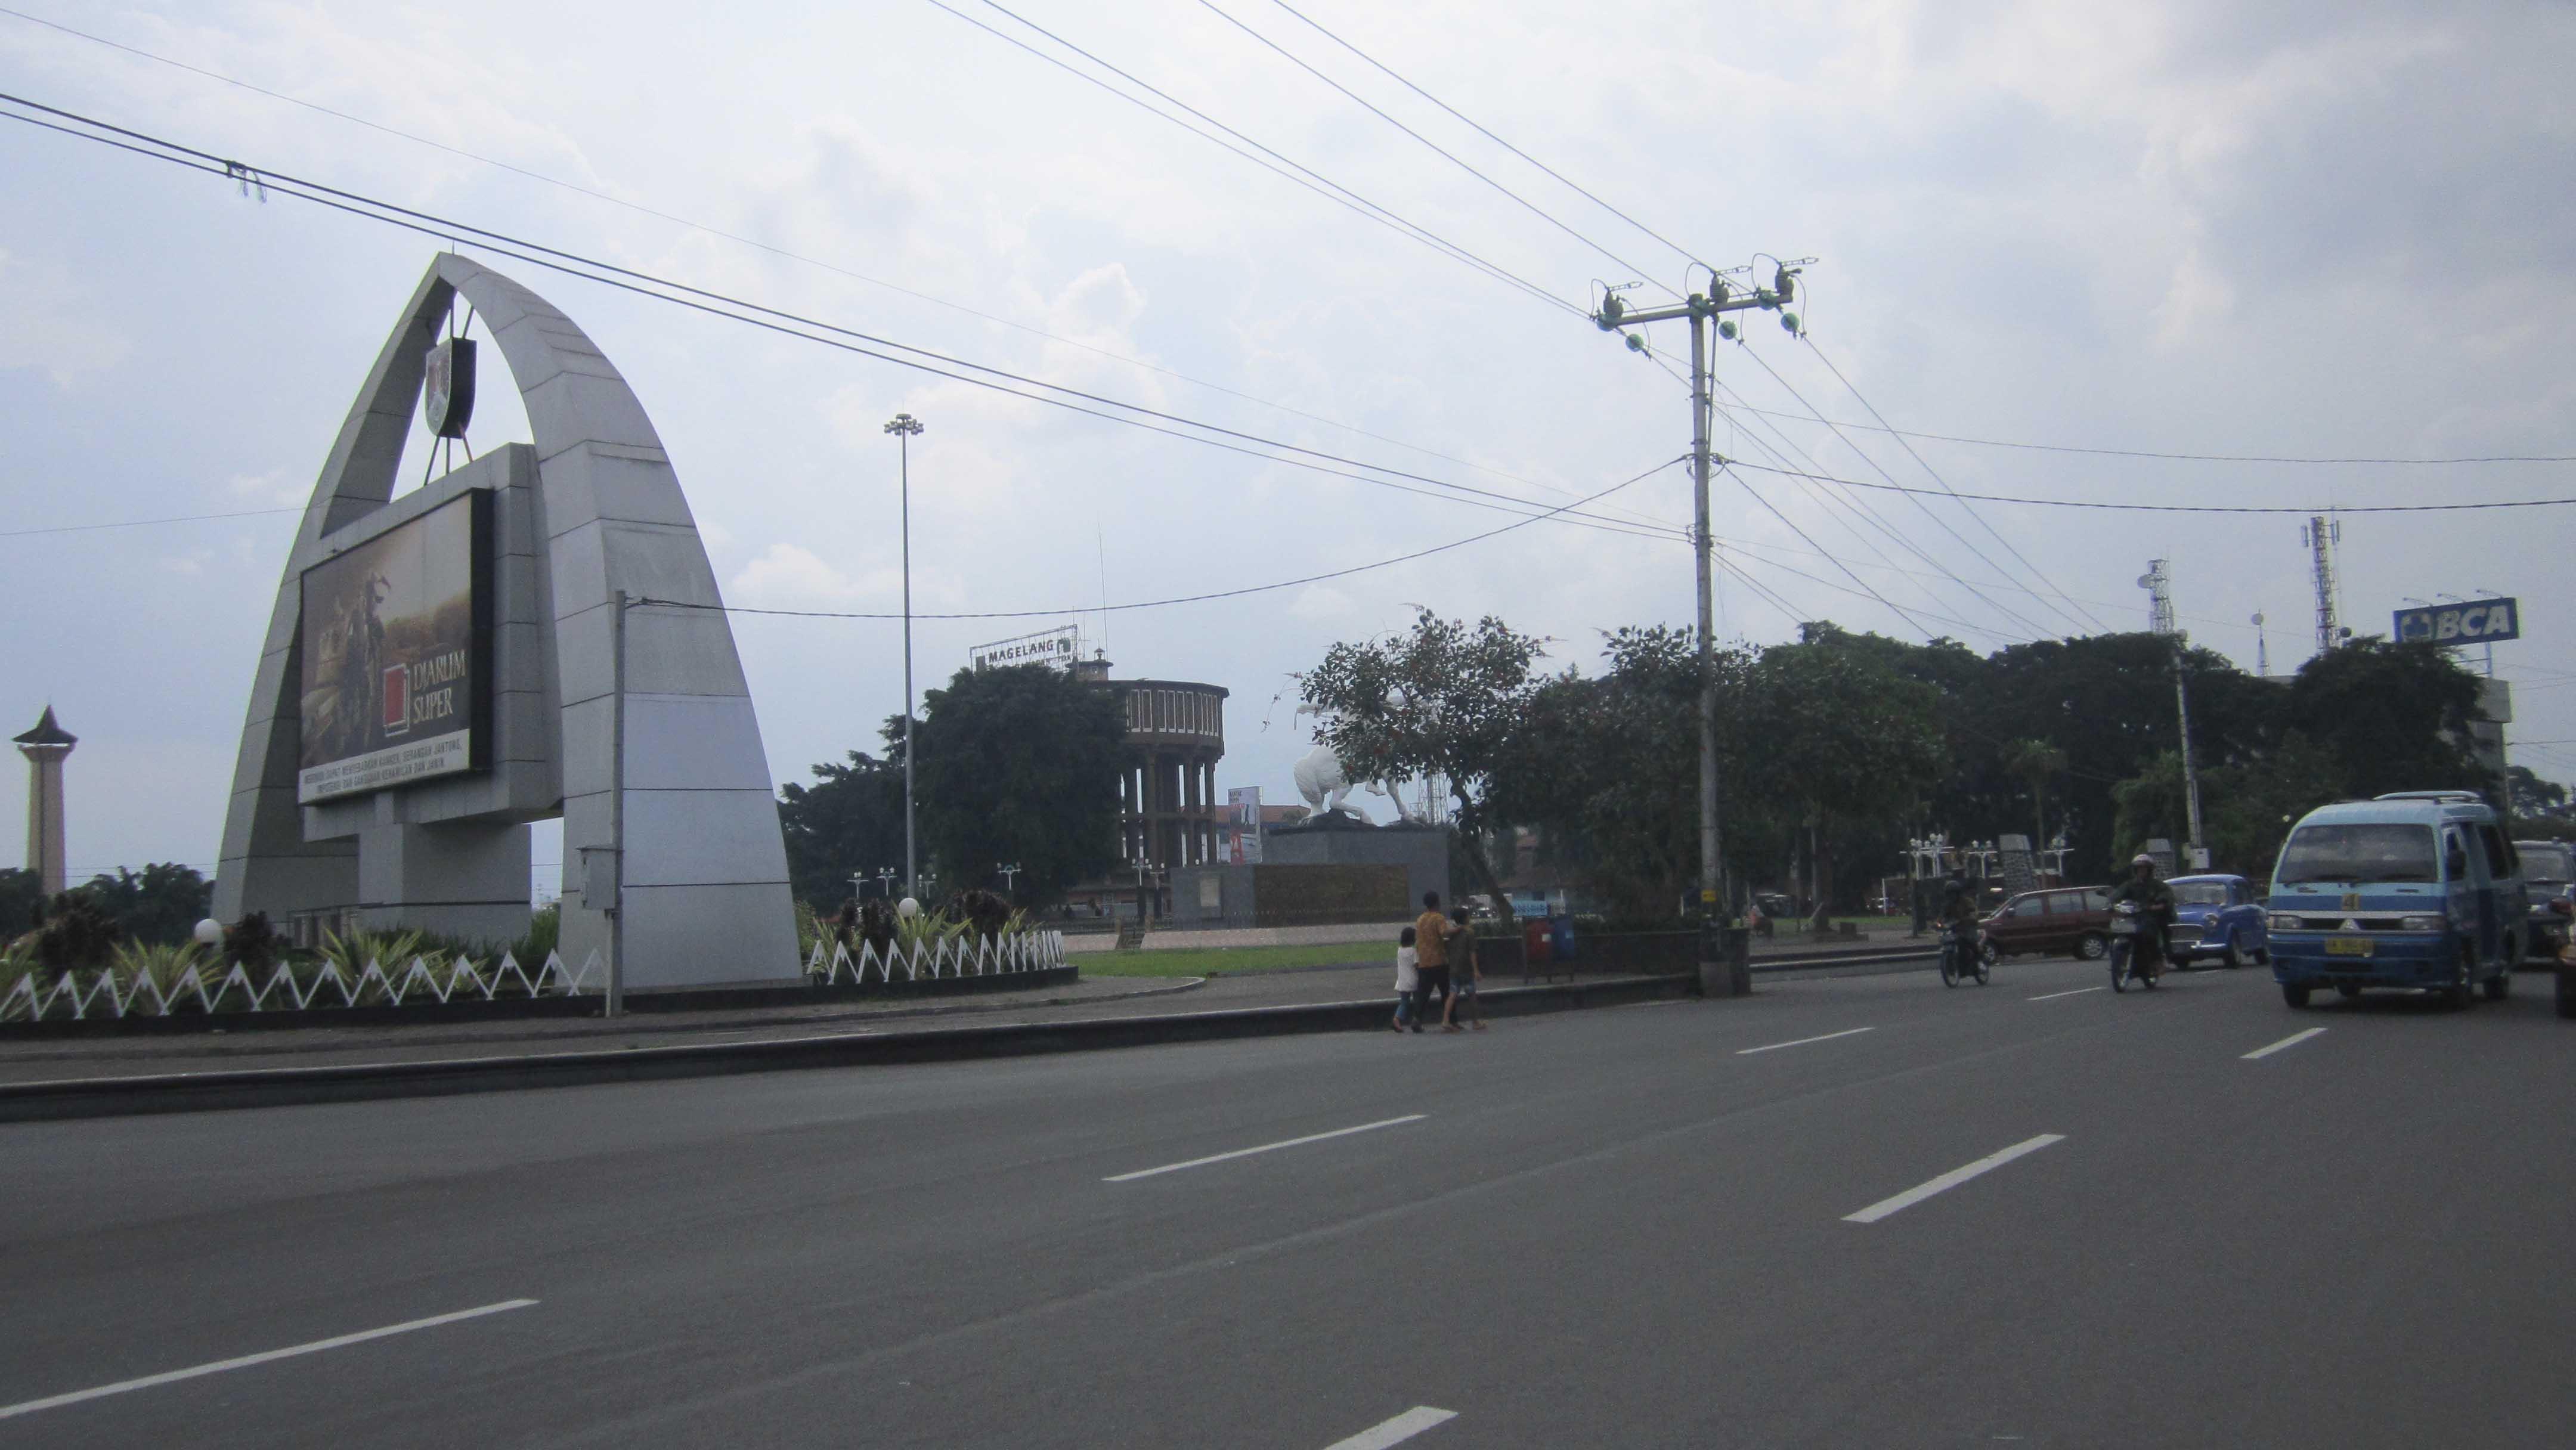 Jalan Alun Magelang Jpg Landscape City Kota Kab Wonogiri